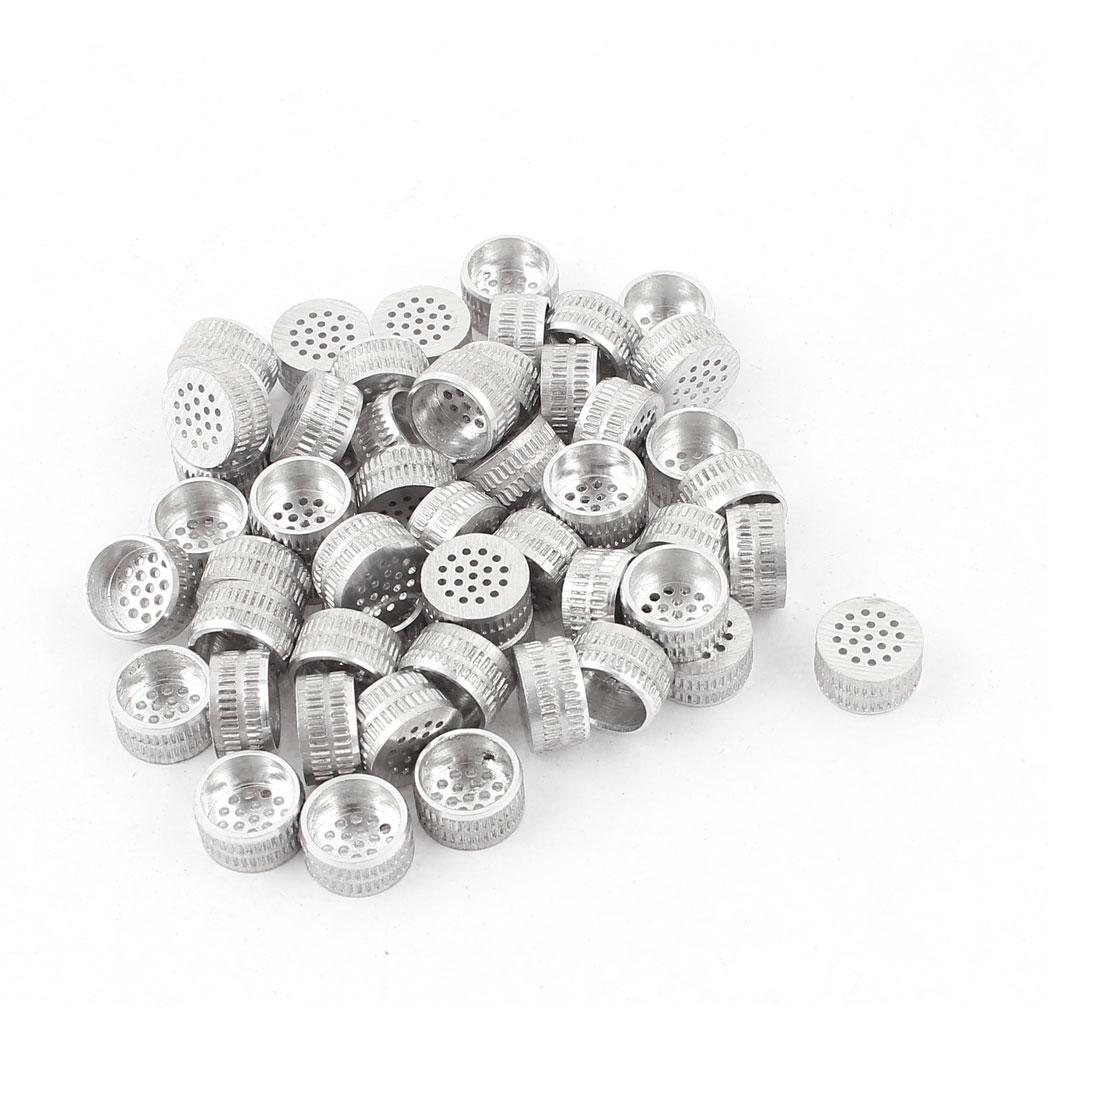 50pcs Silver Tone Aluminium Hole Type Core Box Vents 10mm x 5mm